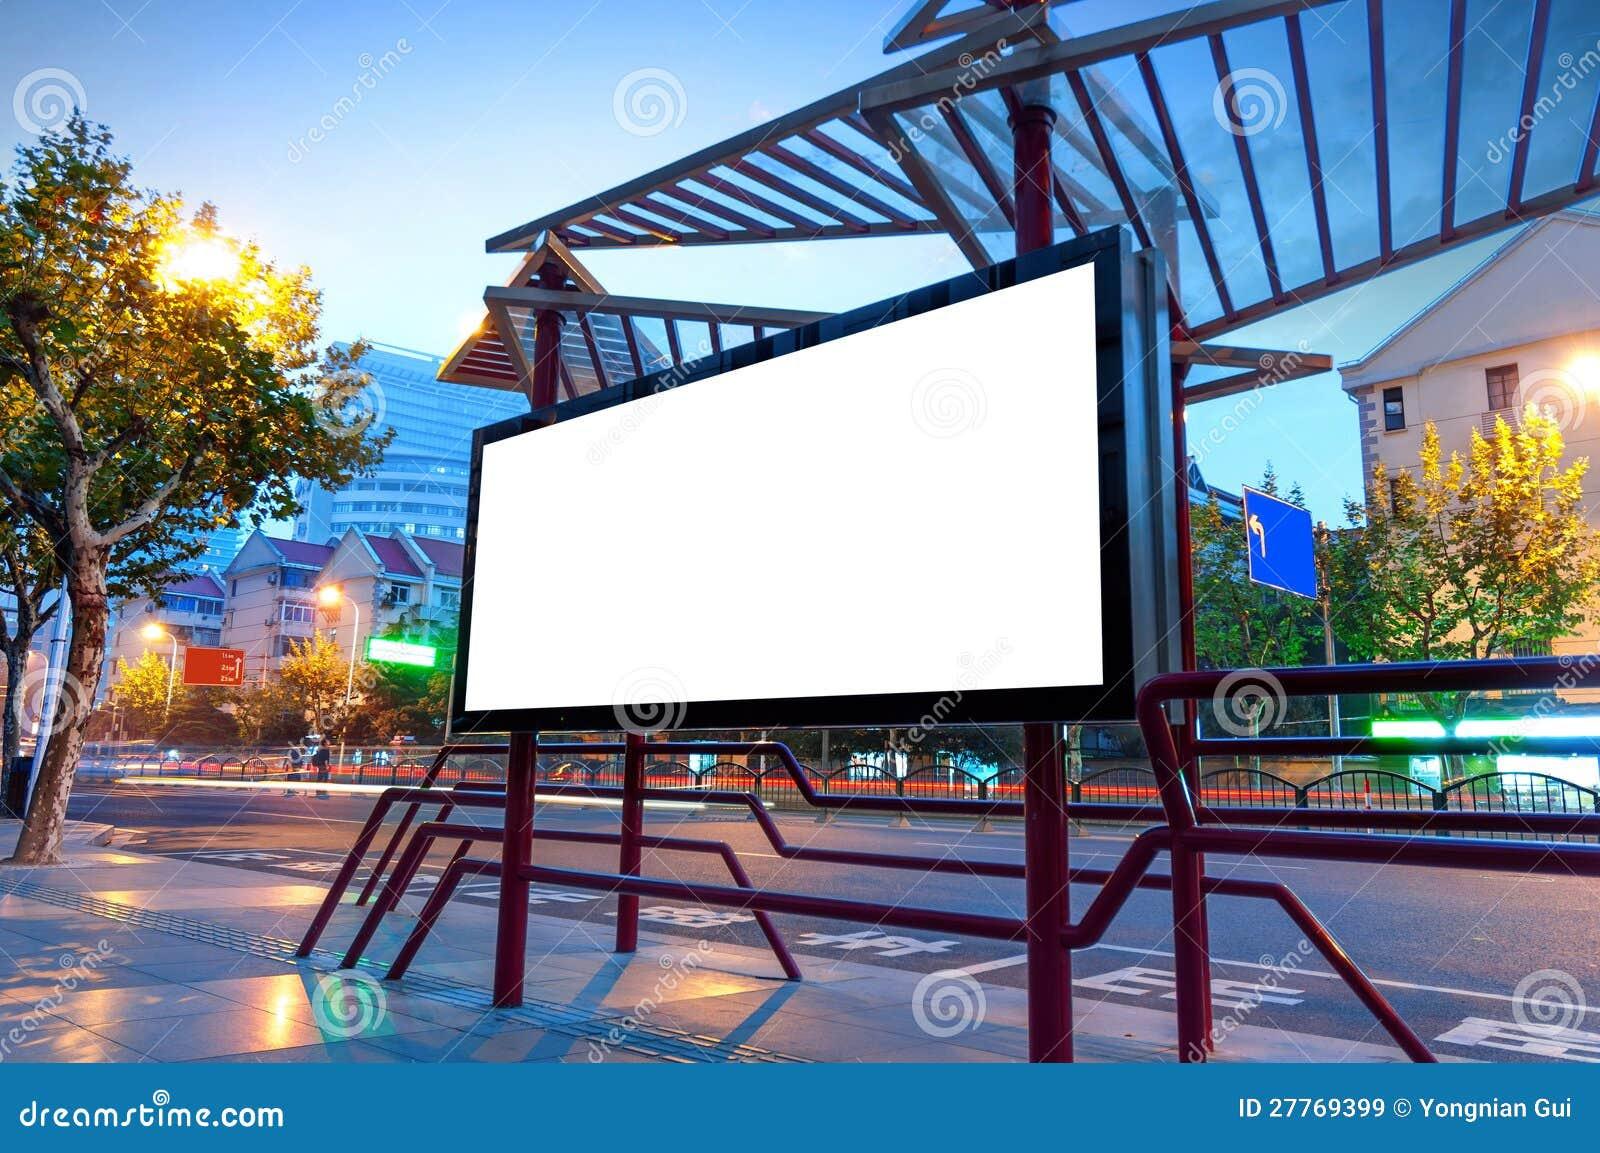 Blank Billboard At Night Royalty Free Stock Images - Image: 27769399